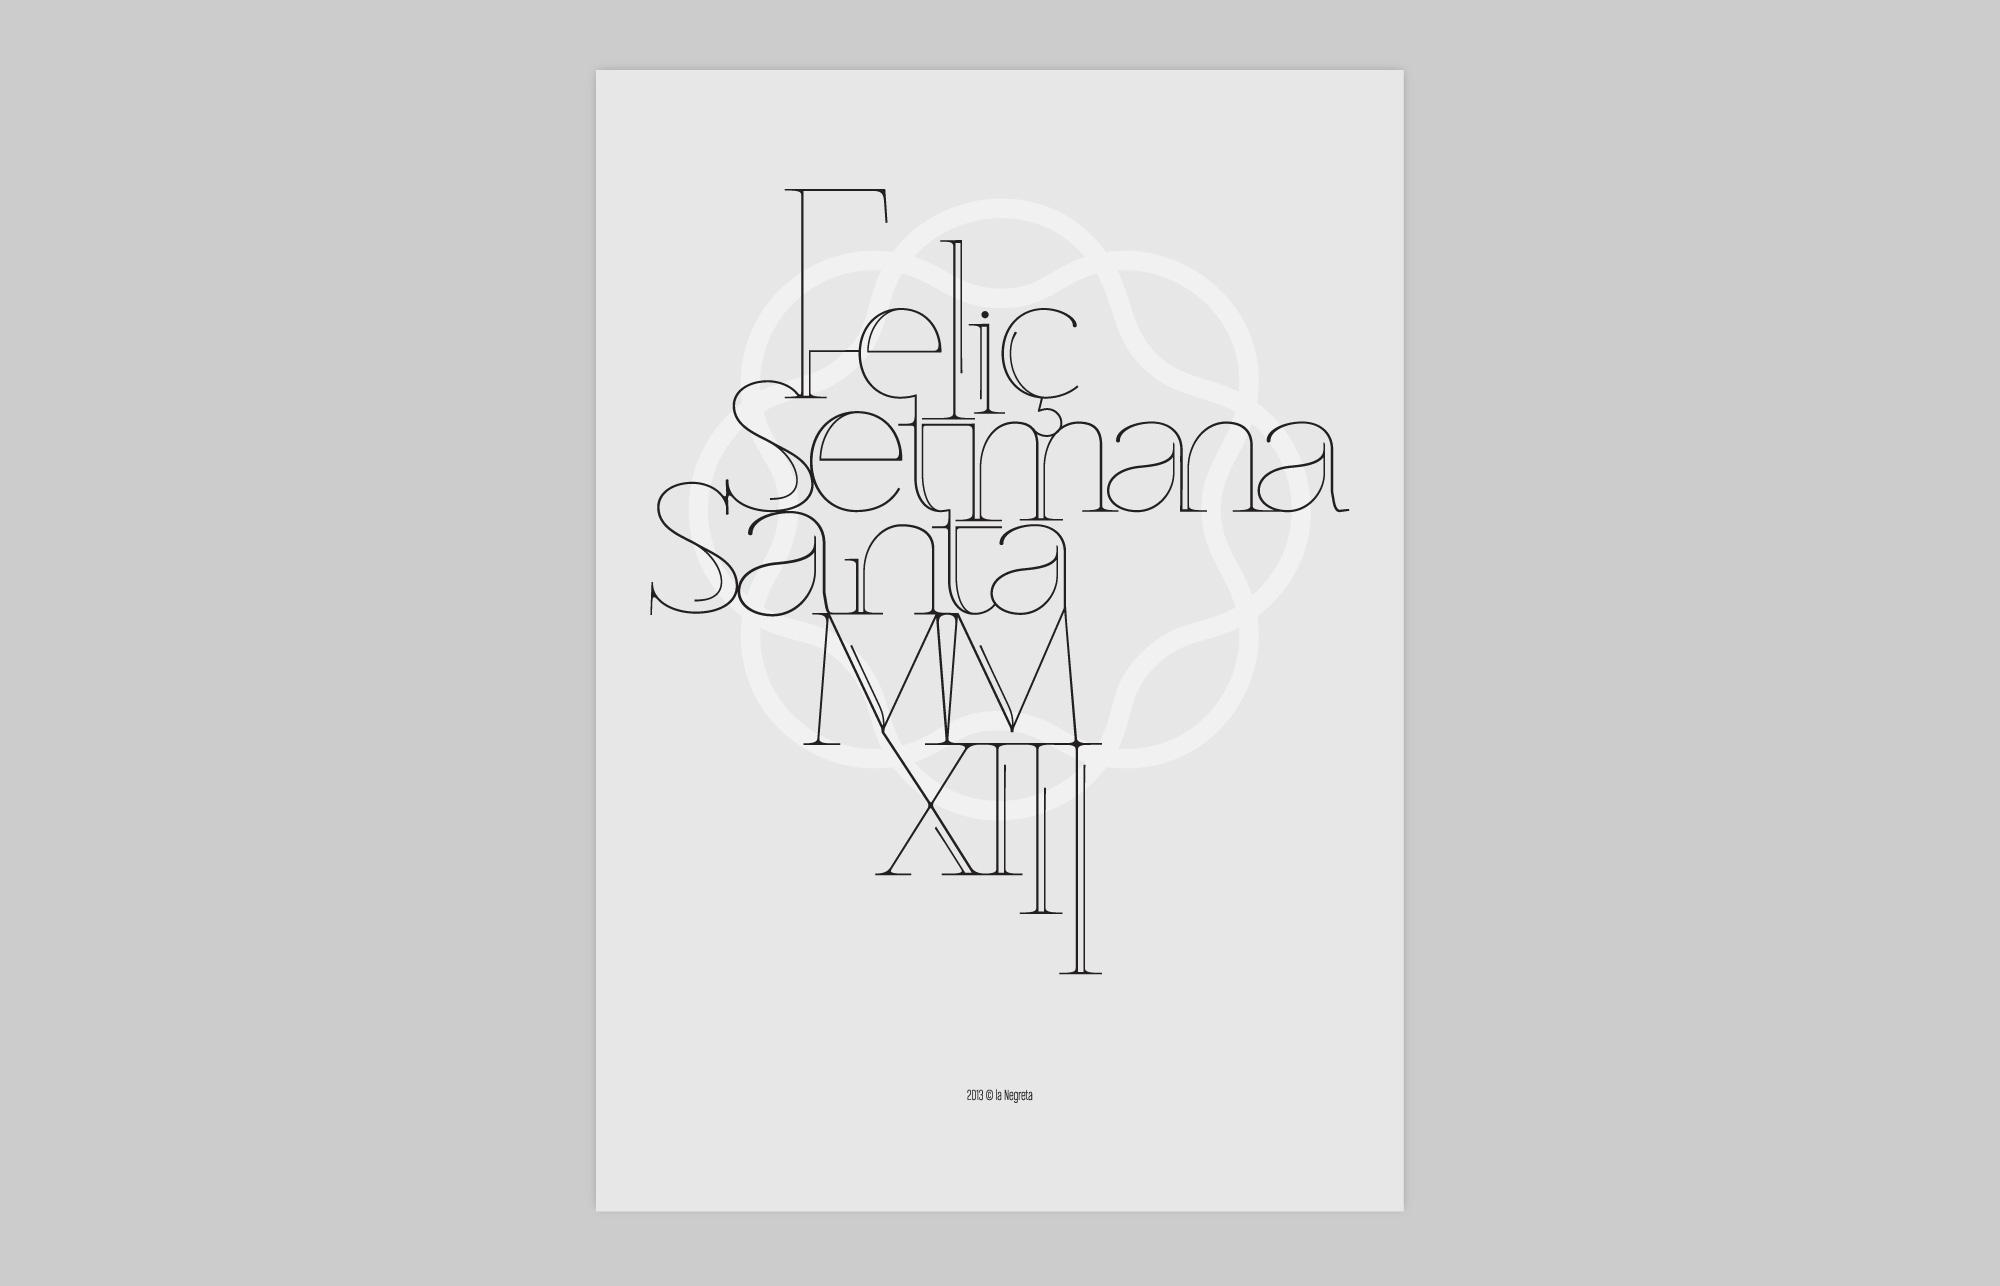 LN-SSANTA-2013B-1.jpg